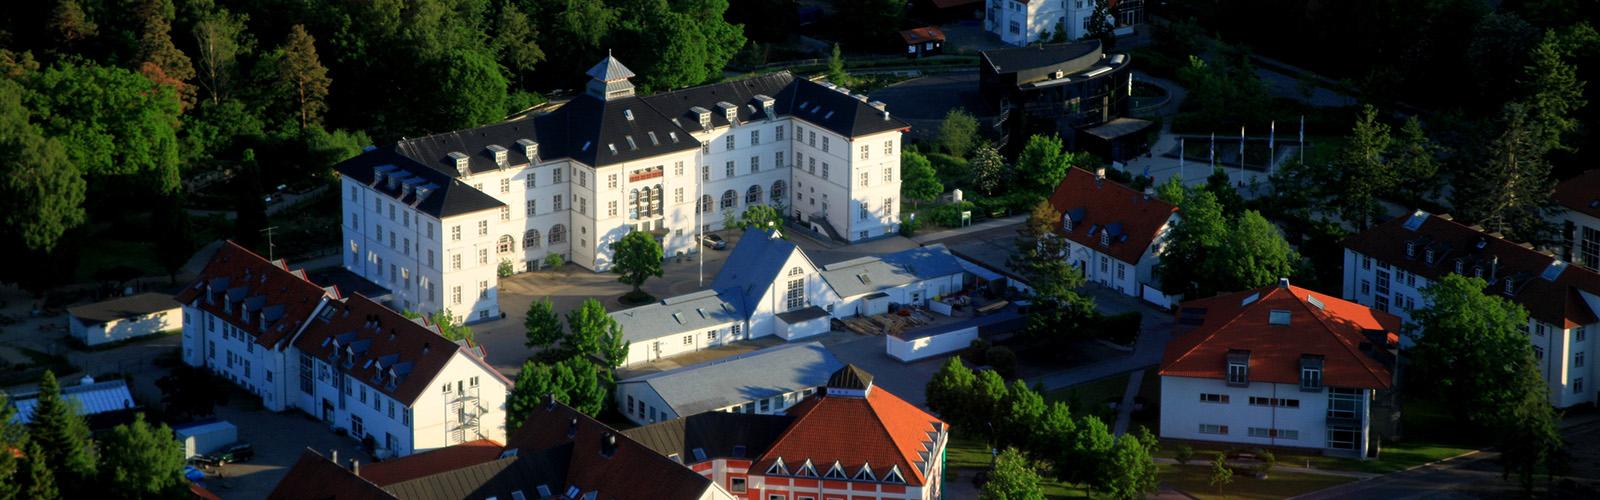 Jyllandsträffen 14-17 juni 2018